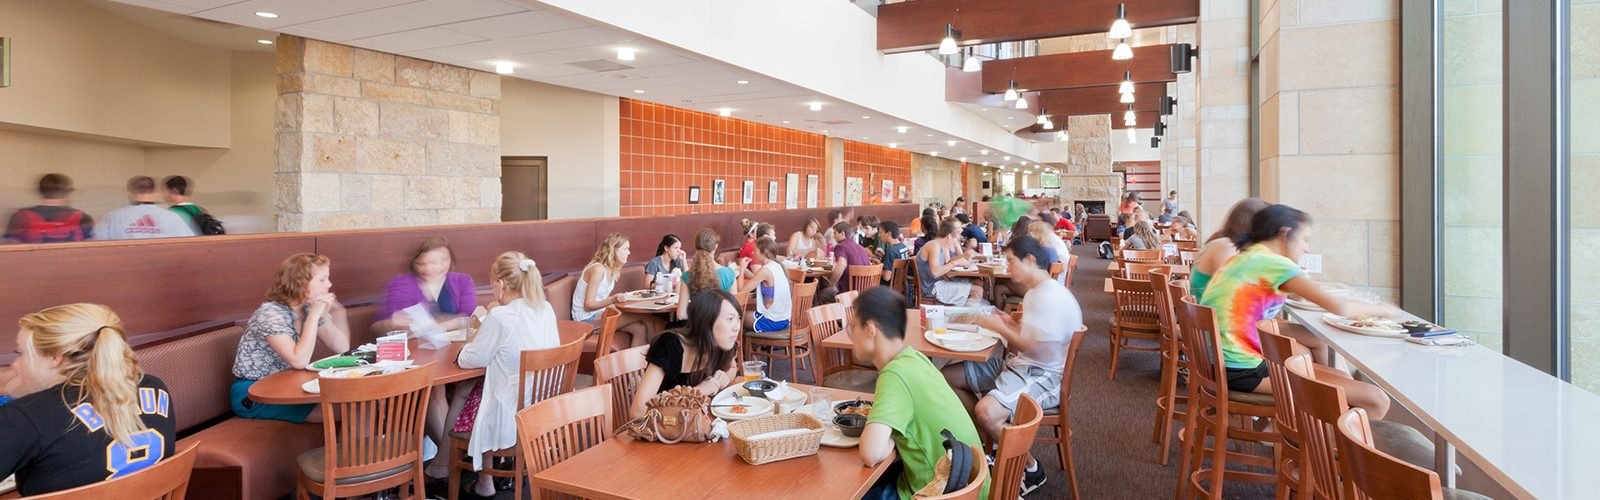 Gordon Dining & Event Center